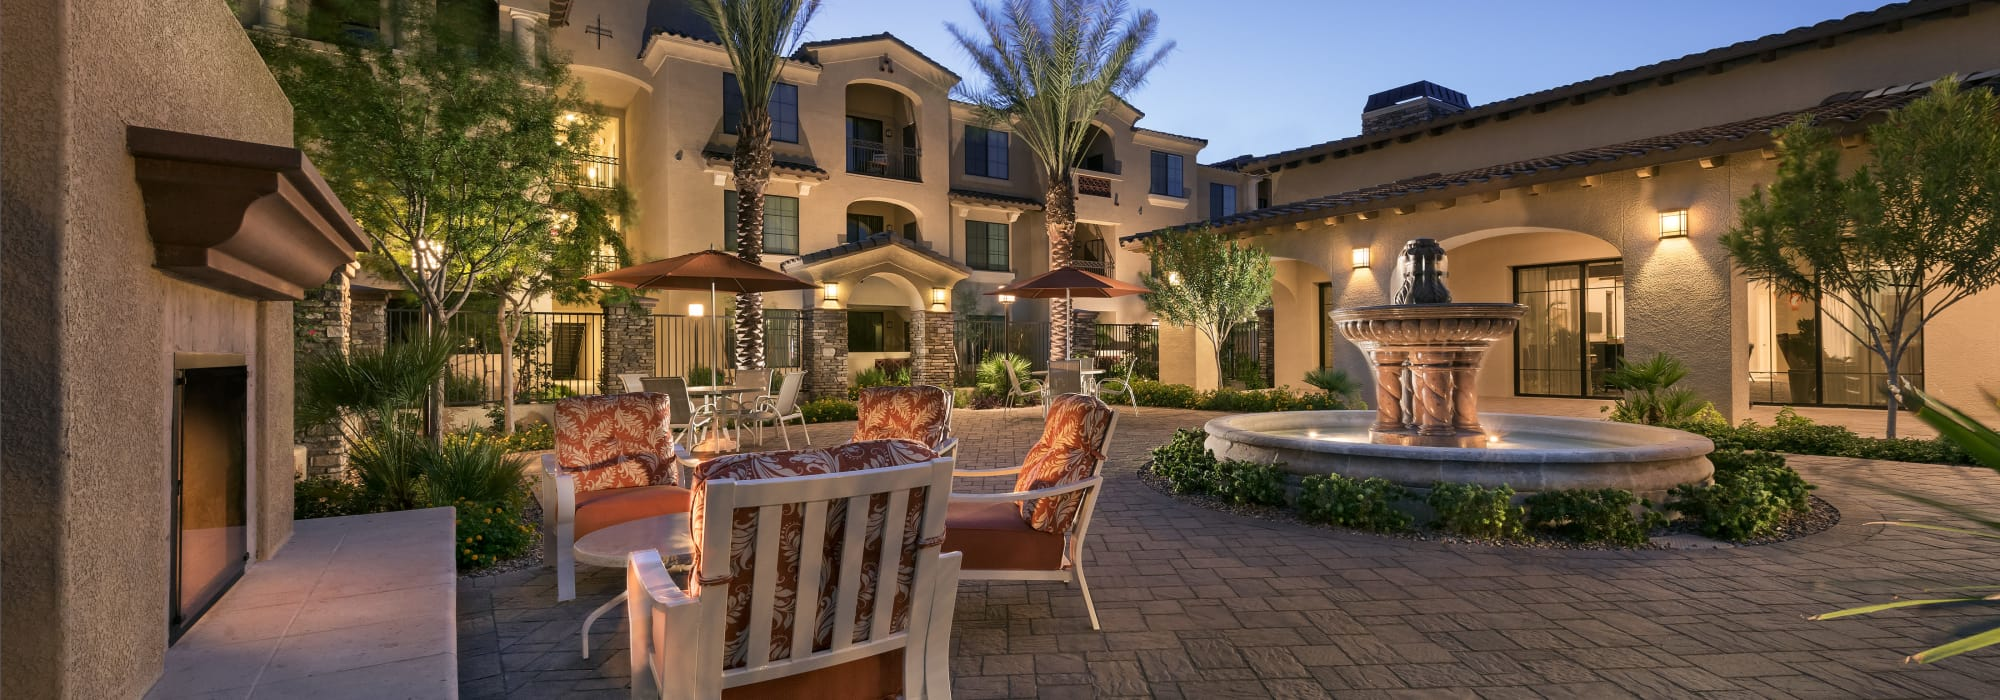 Courtyard with fountain at San Milan in Phoenix, Arizona